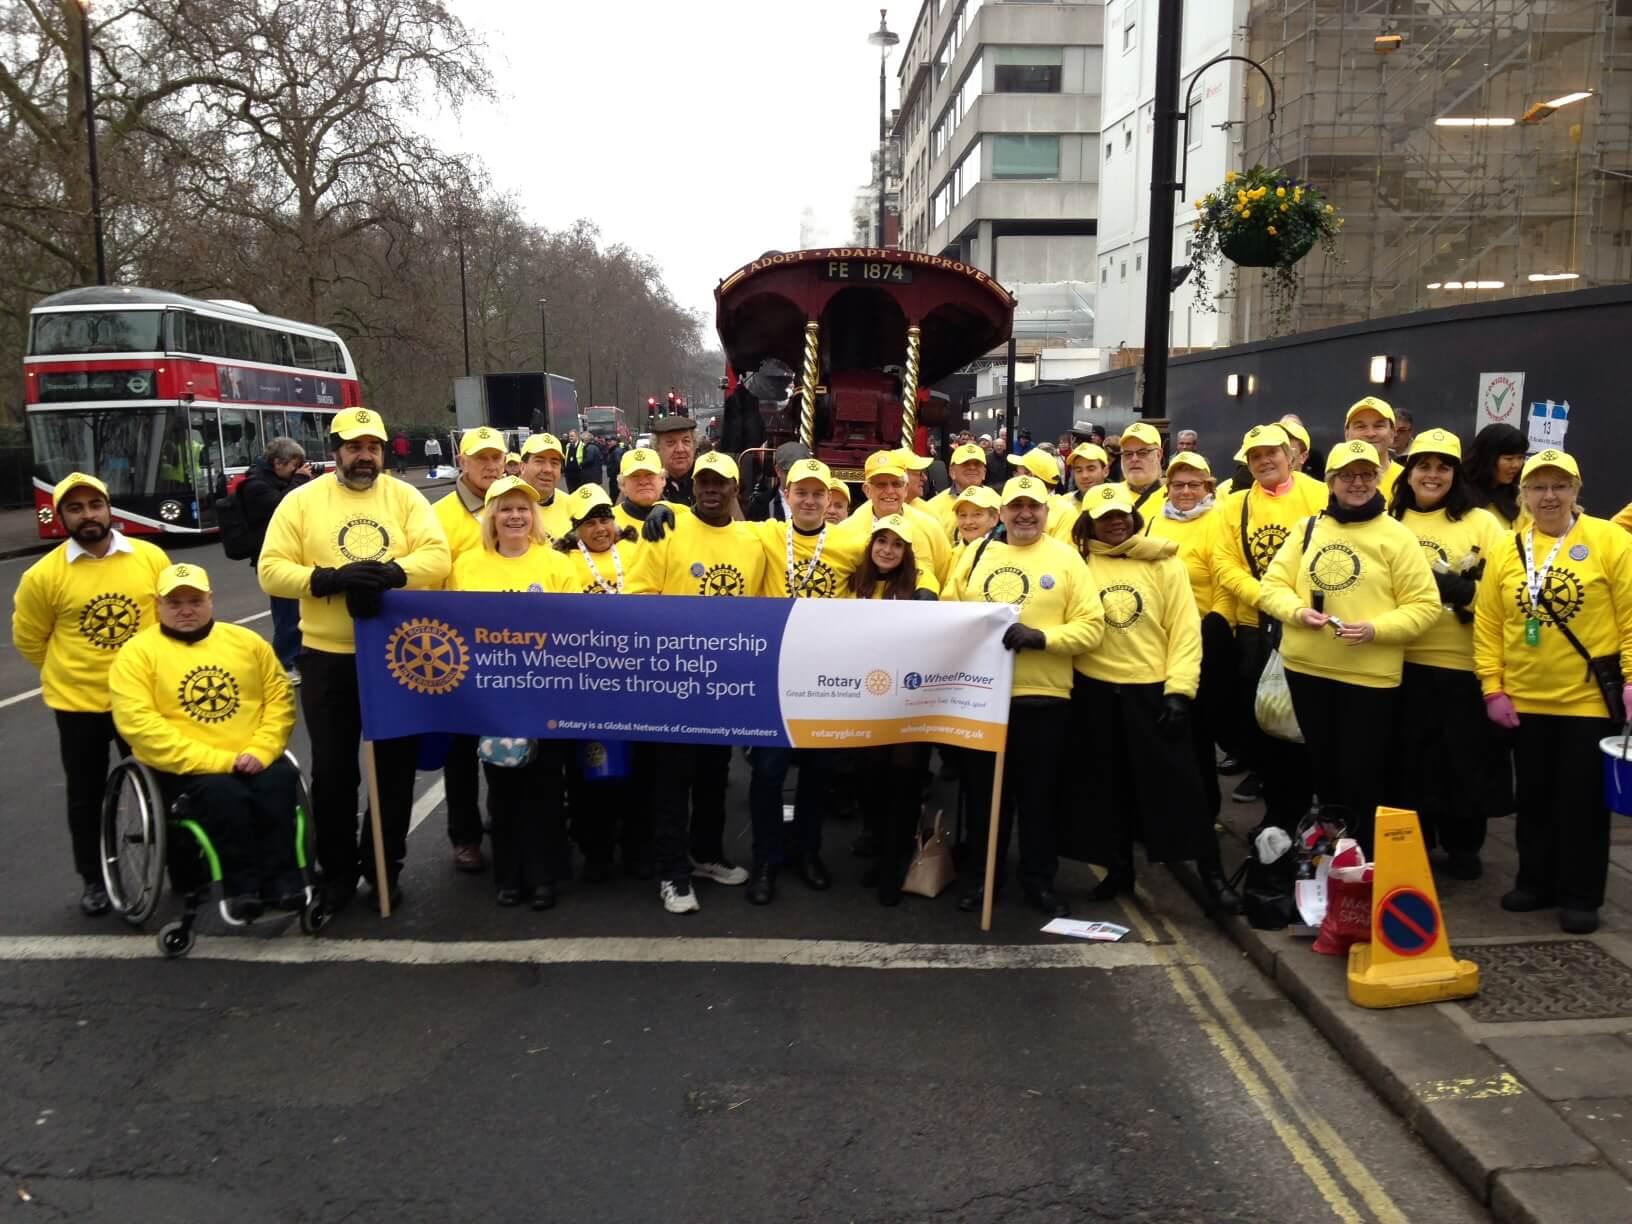 Rotary kicks of 2015 in London New Year's Day Parade